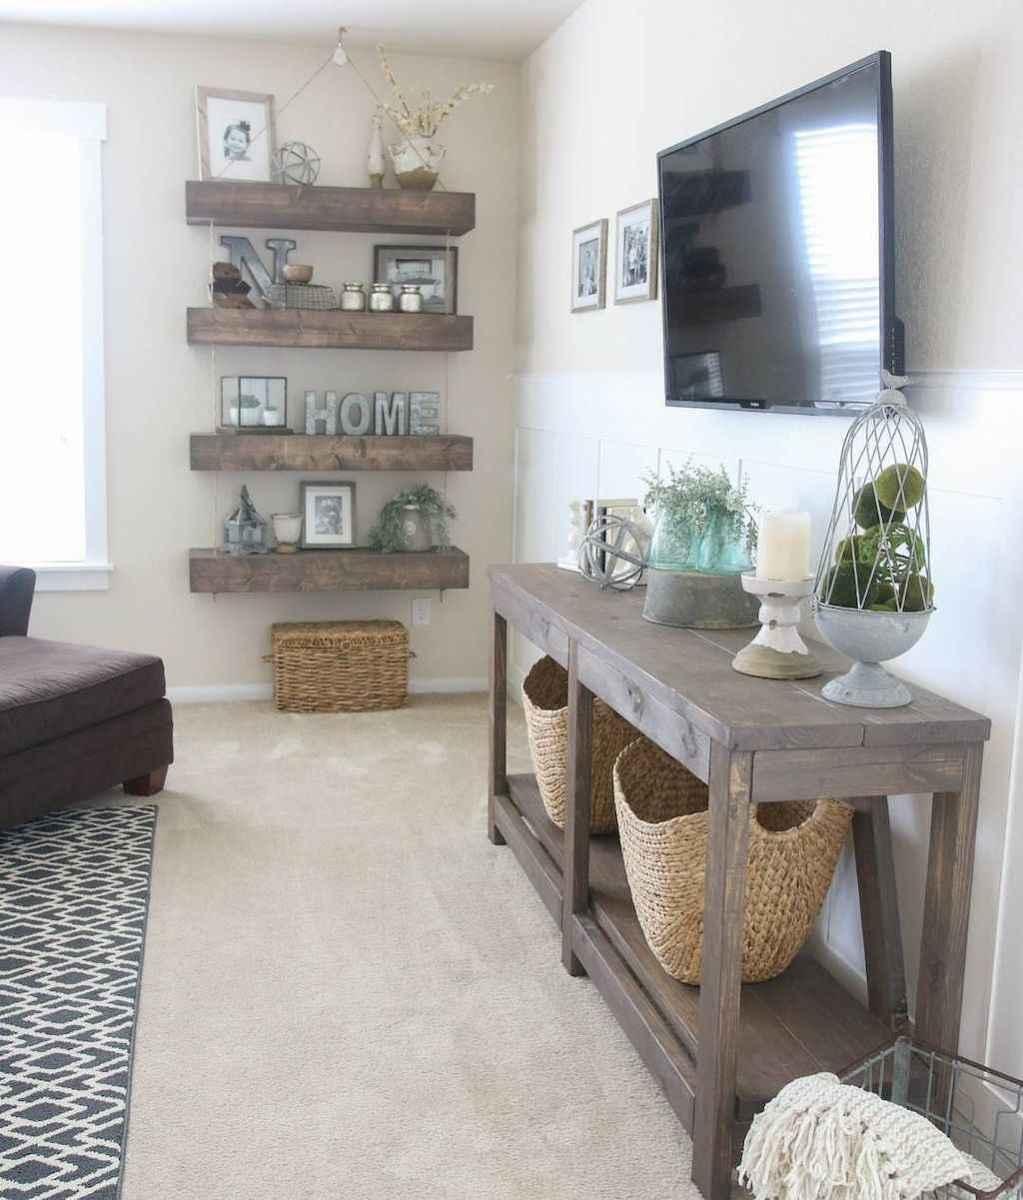 60 brilliant master bedroom organization decor ideas (13)